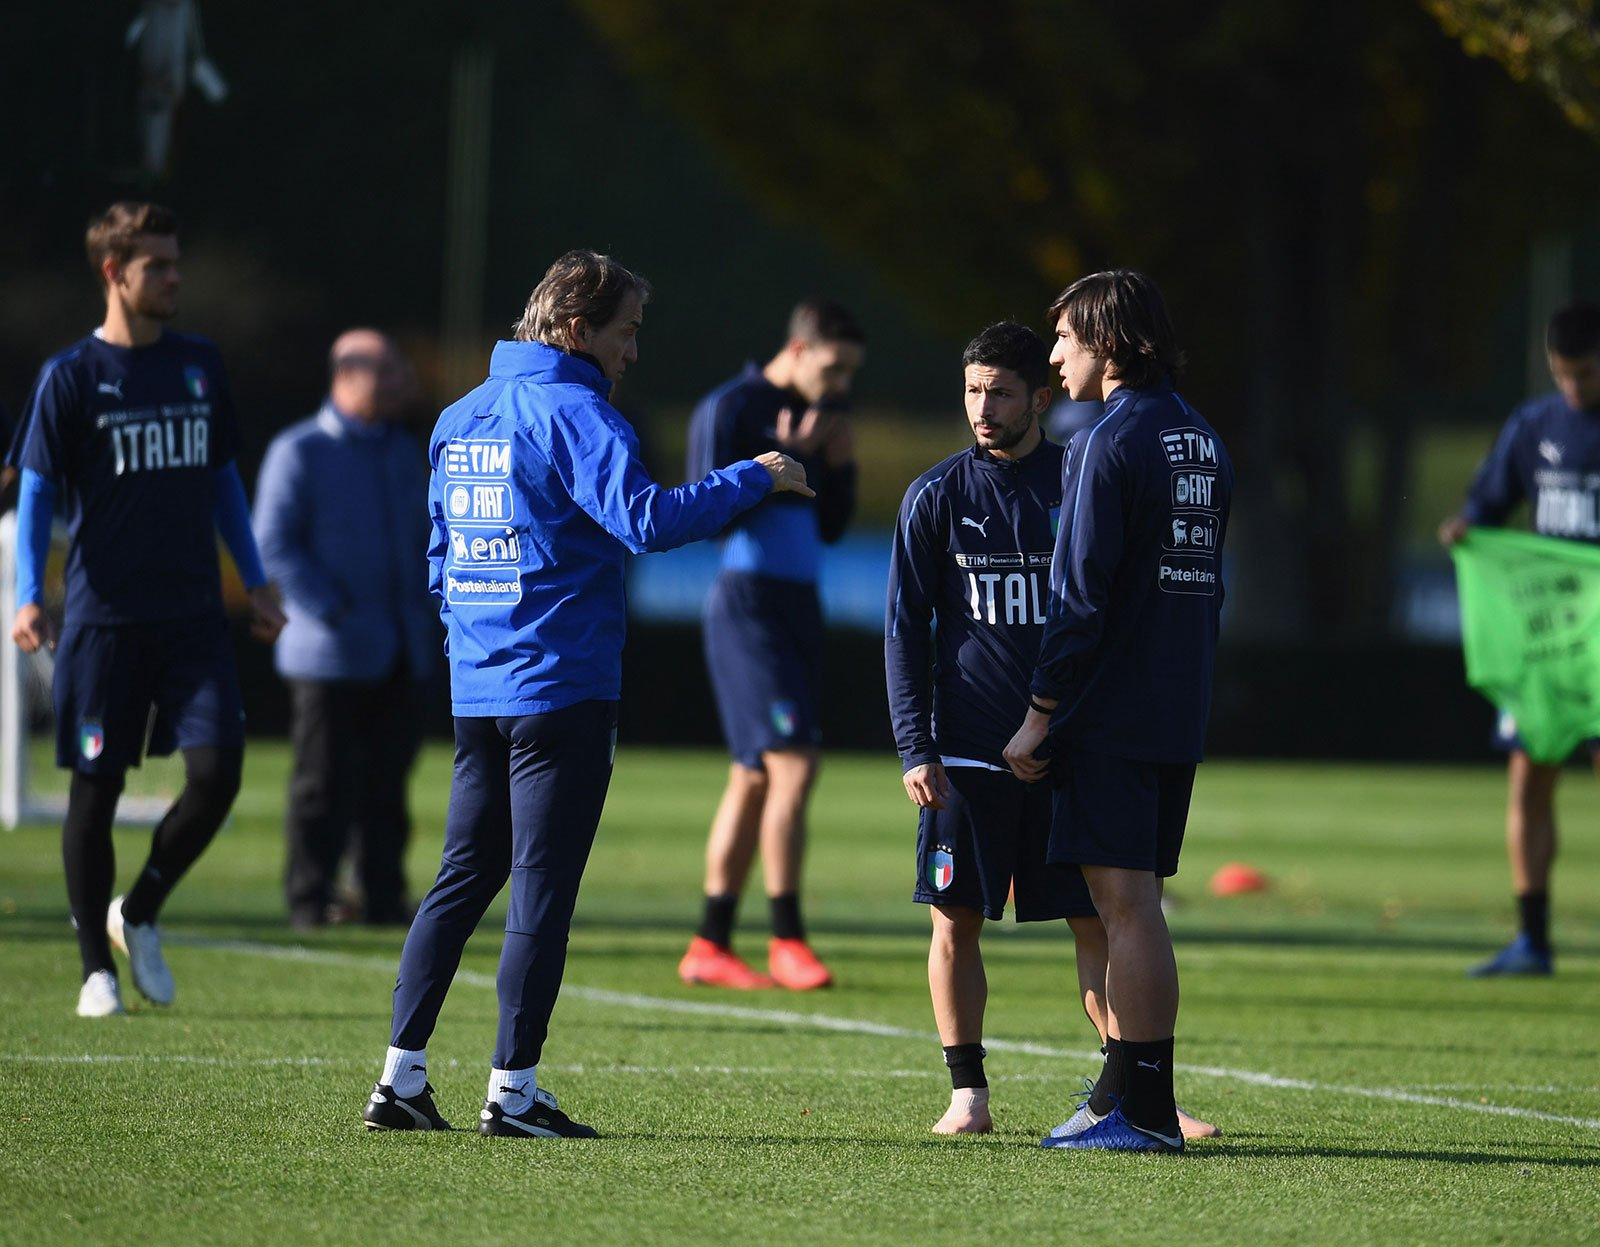 Sandro Tonali and Stefano Sensi talking to Roberto Mancini during an Italy training session at Appiano Gentile on November 18, 2018. (Photo by Claudio Villa/Getty Images)